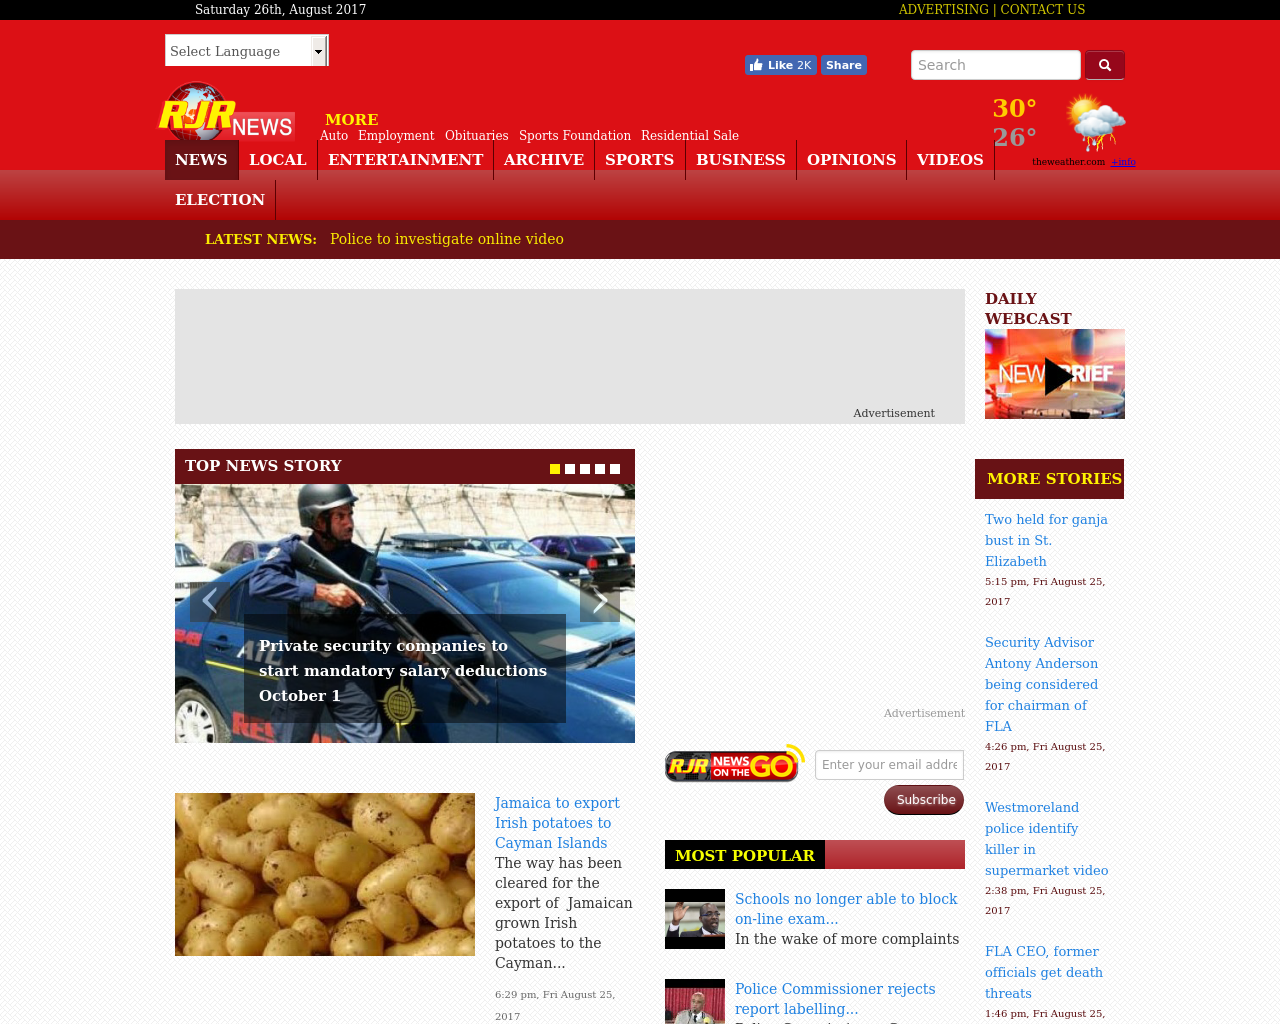 RJR-News-Advertising-Reviews-Pricing